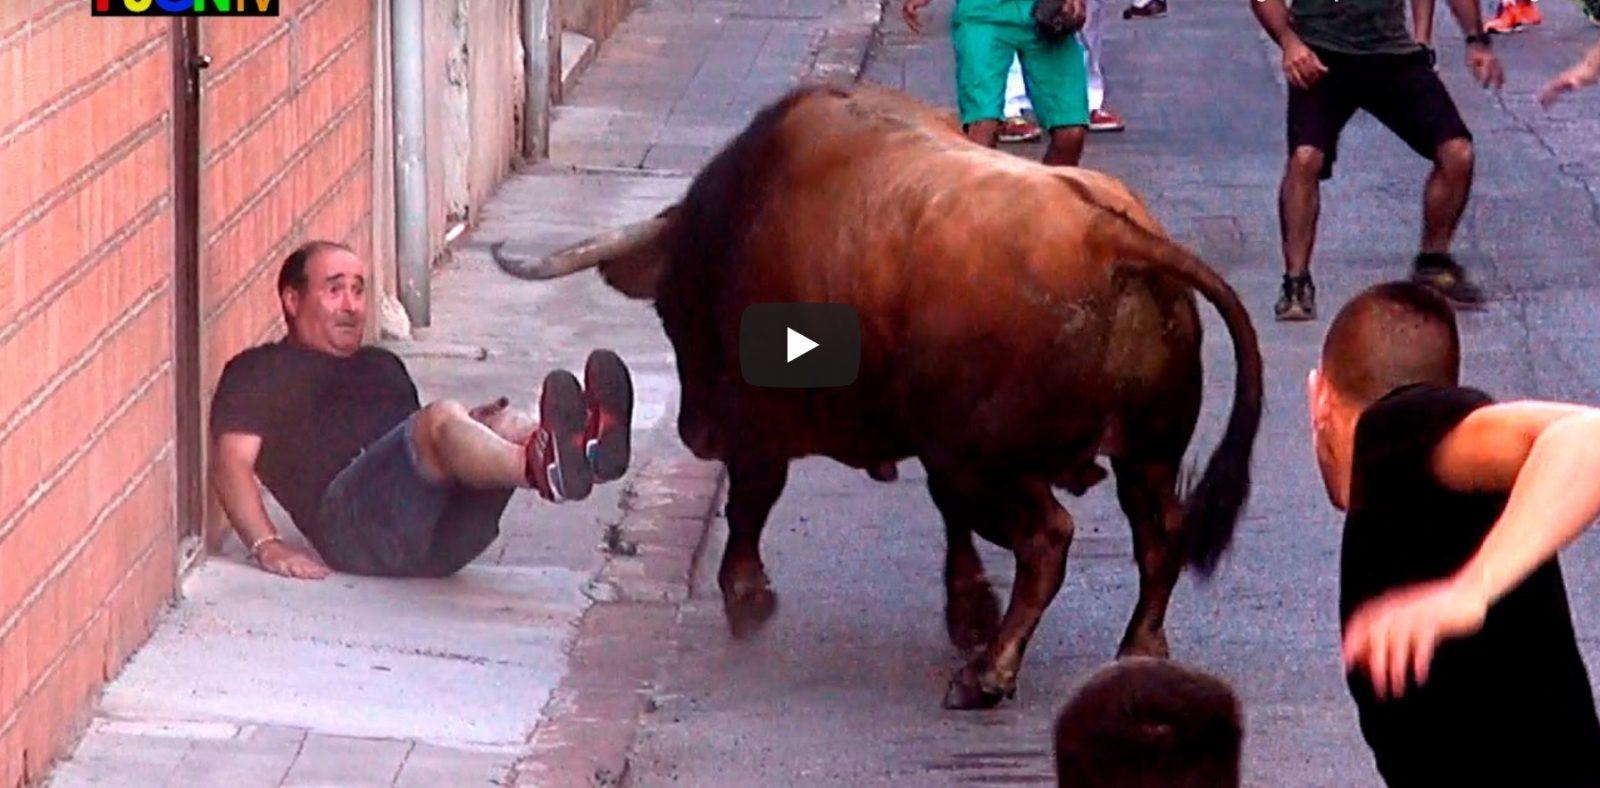 VIDEO DU NET // 3 Toros Fiestas Barrio Sant Joan – Nules (Castellon) Bous Al Carrer